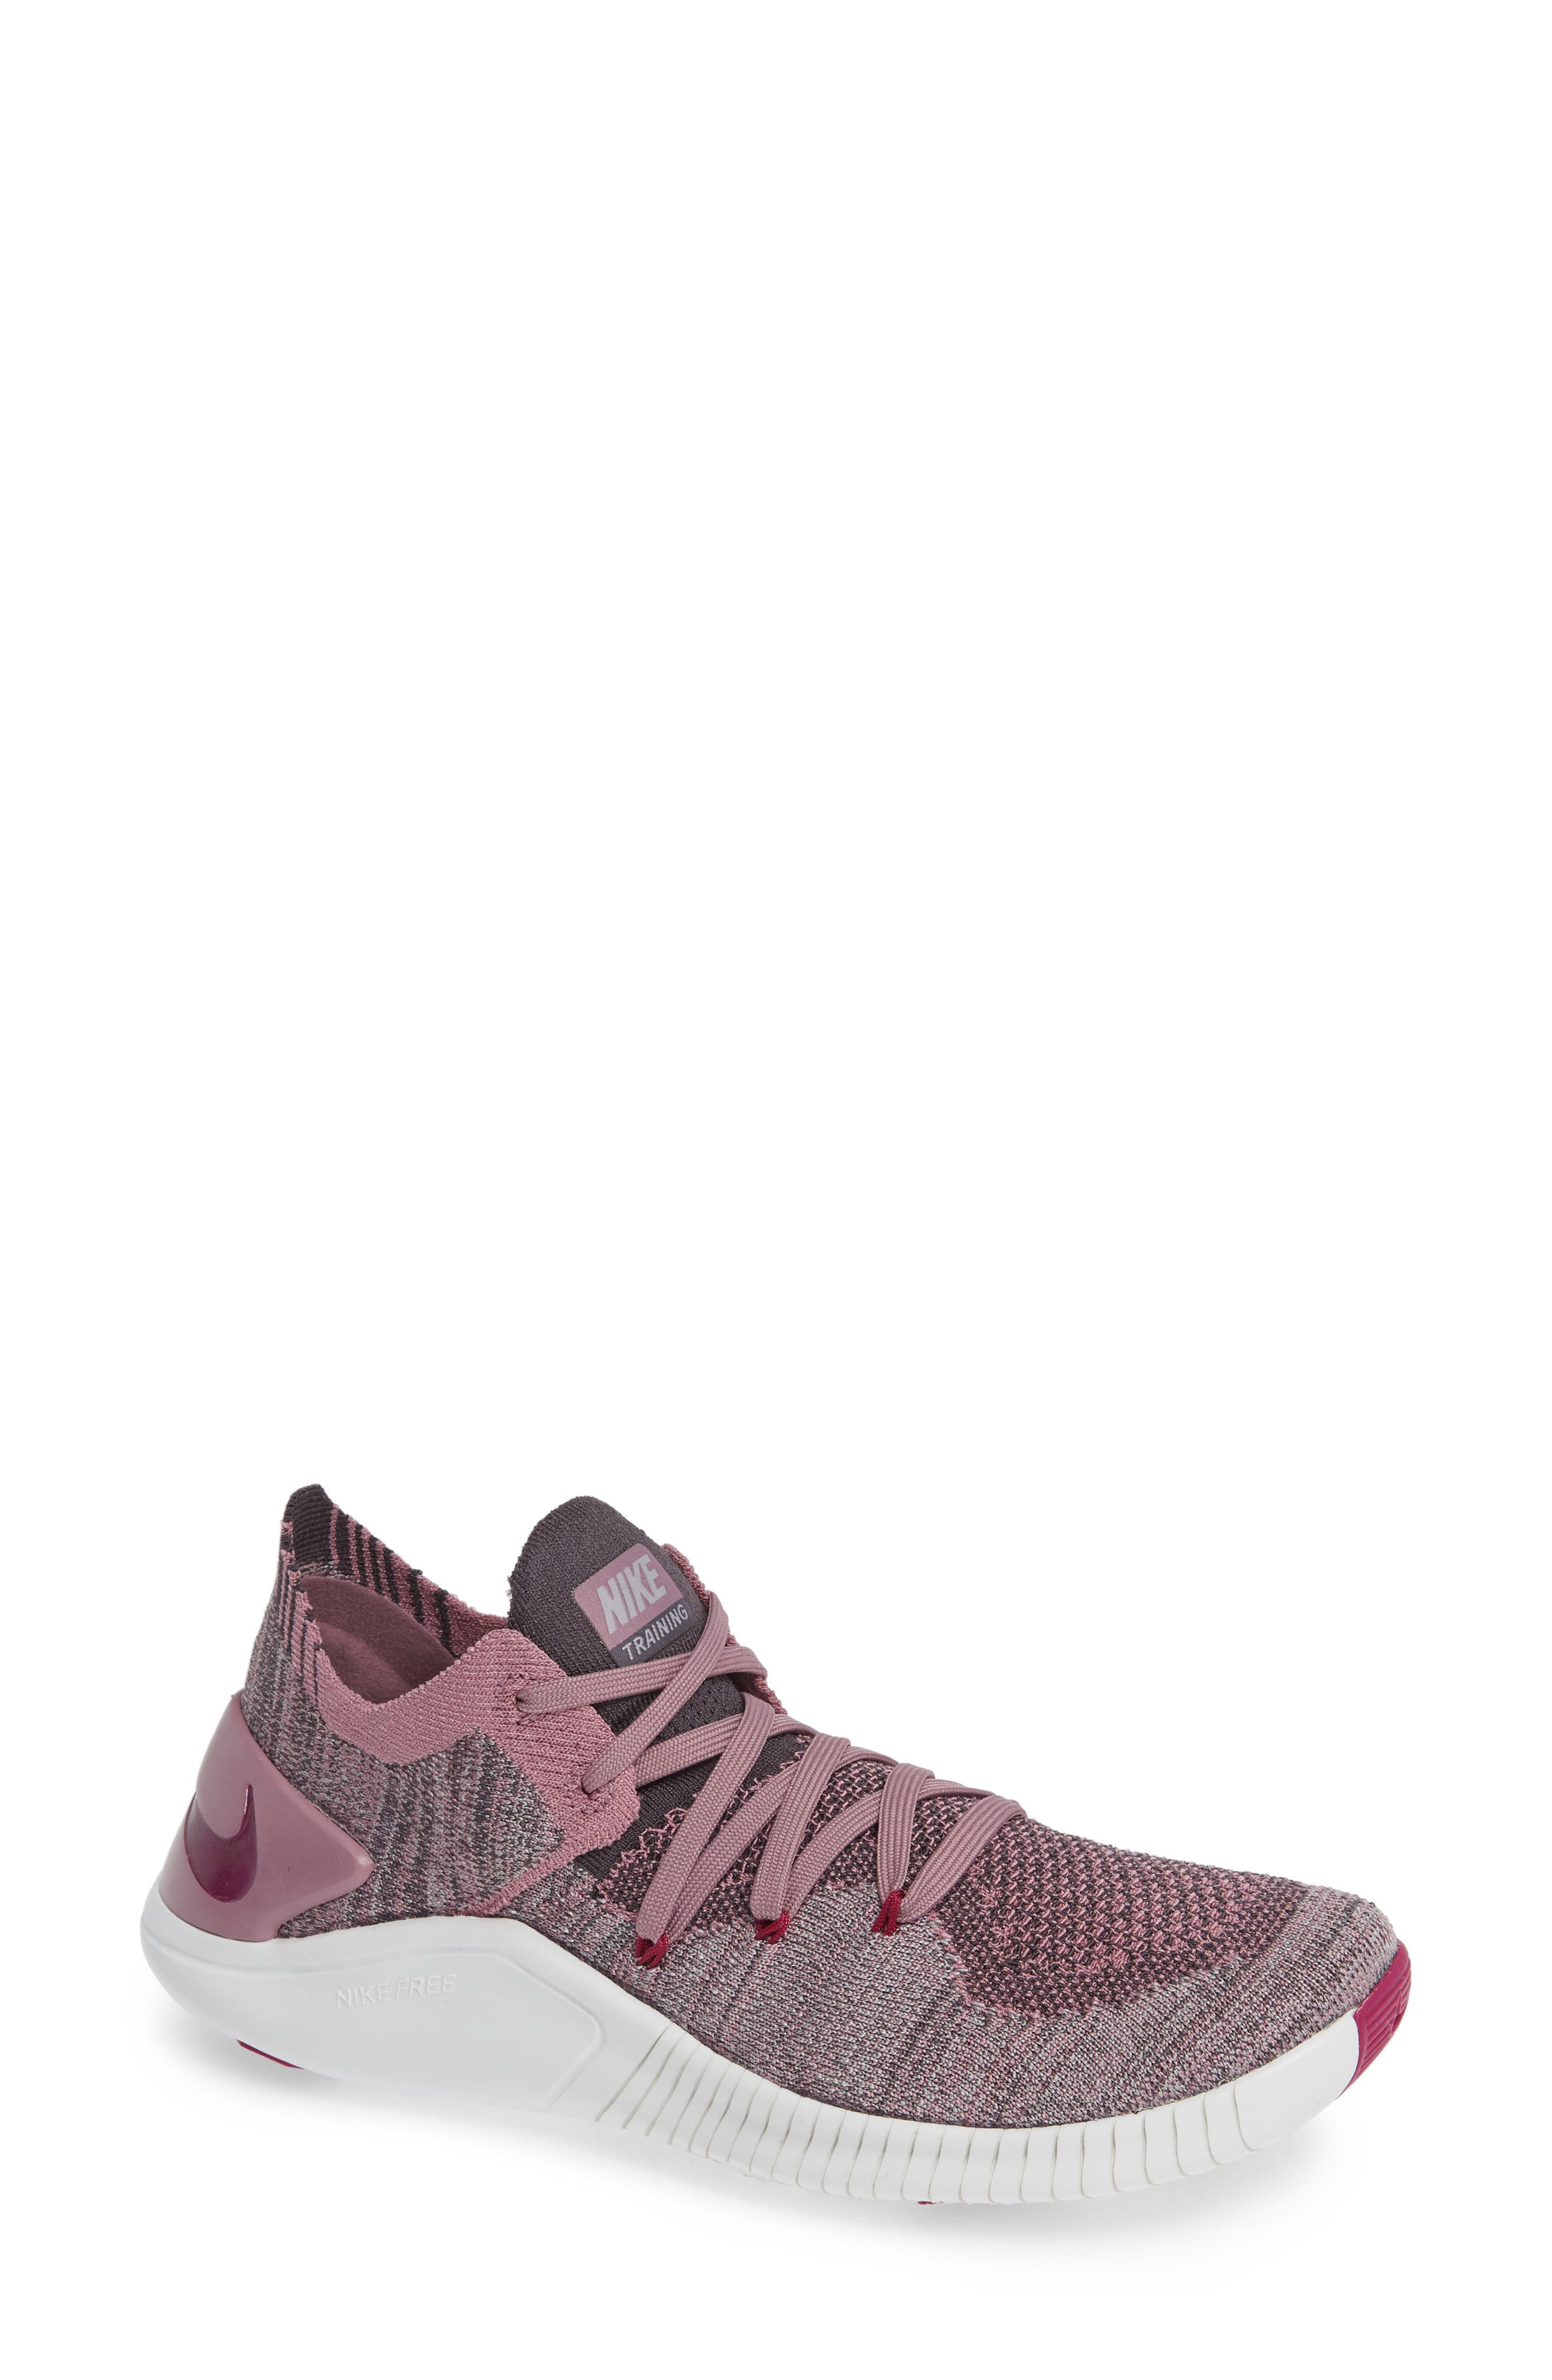 ,                             Free TR Flyknit 3 Training Shoe,                             Main thumbnail 60, color,                             251